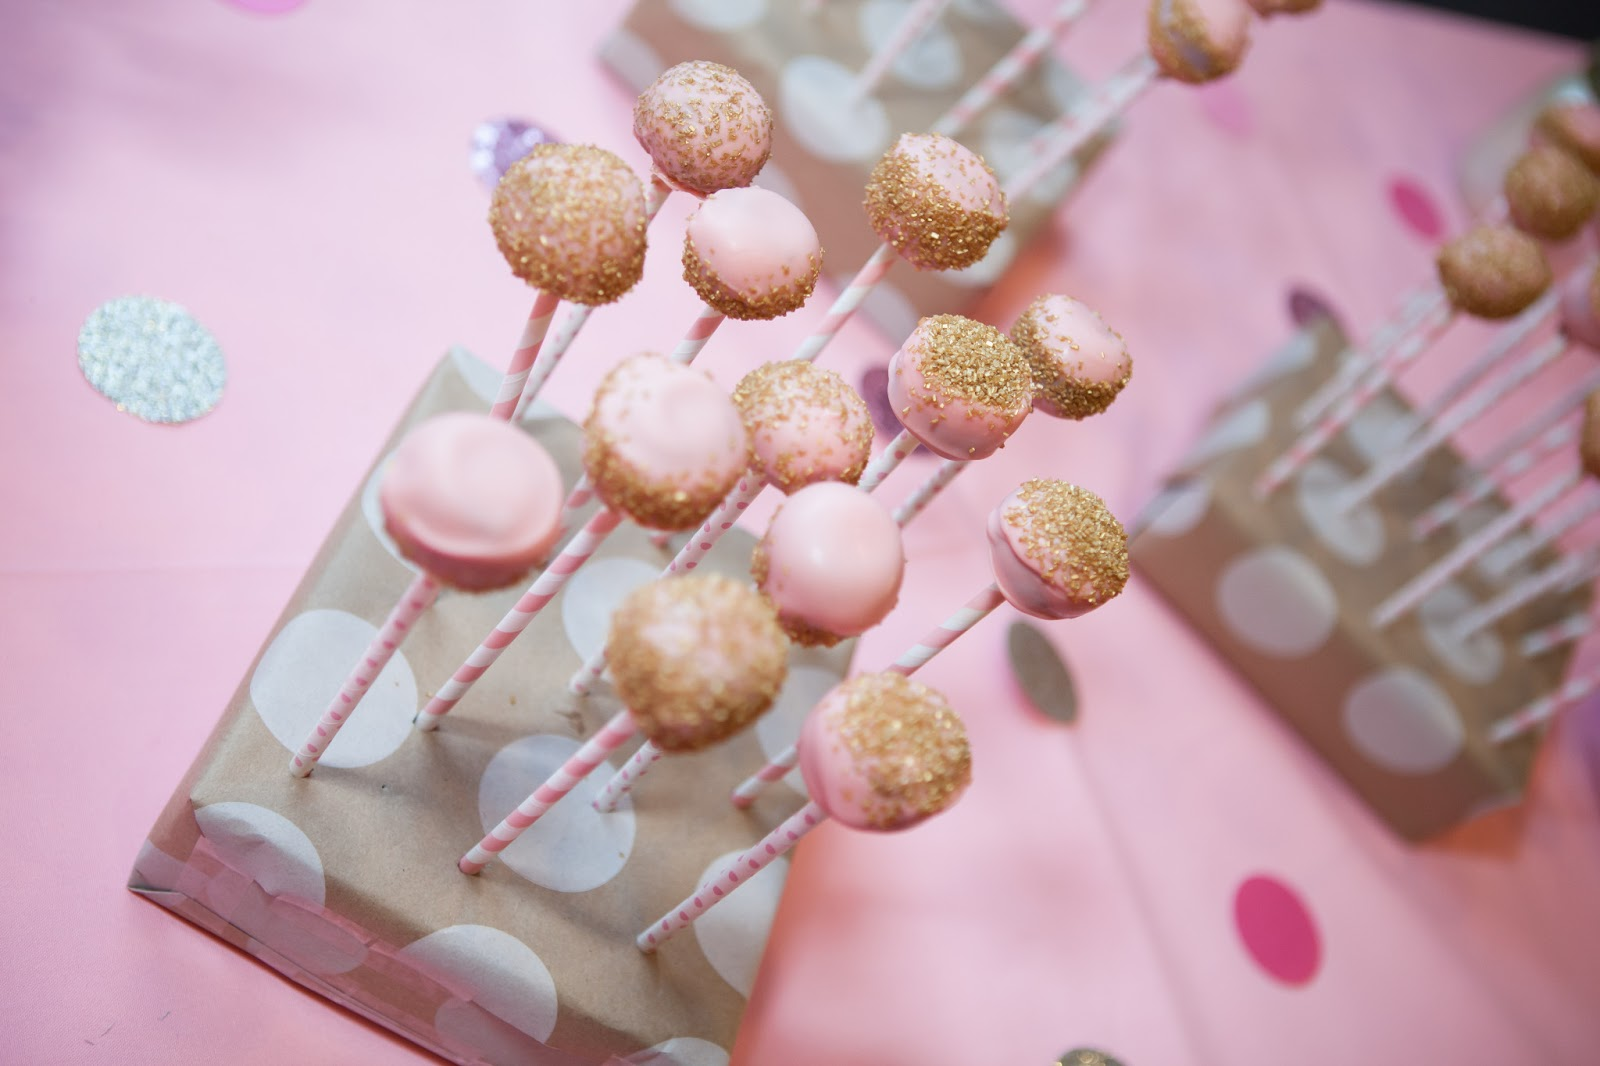 Cake Pop Stand For Straws